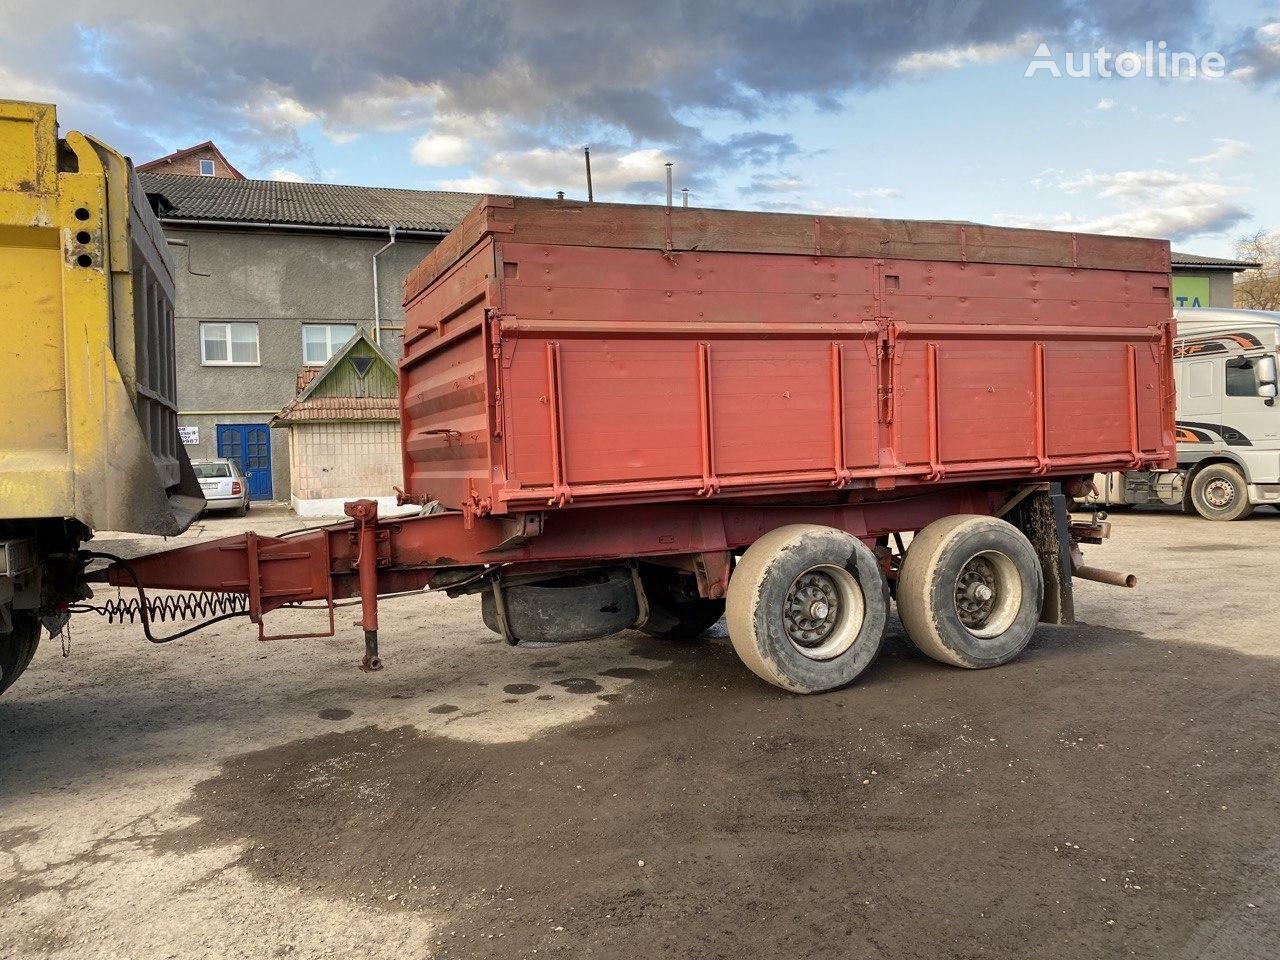 BLUMHARDT dump trailer